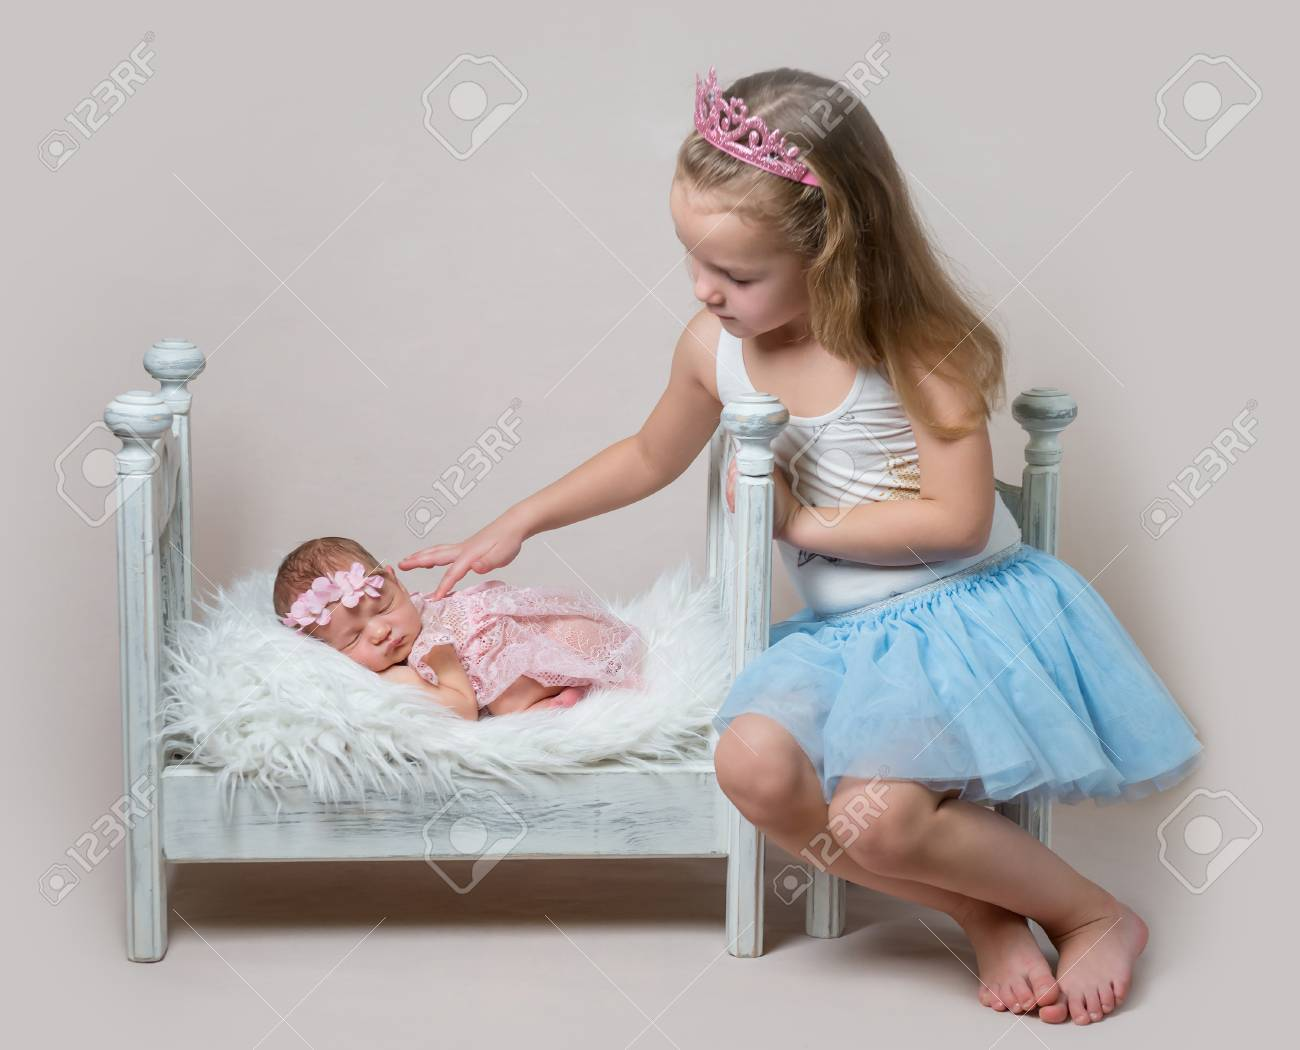 2c4eb35bdd469 Little girl sits next her newborn sister